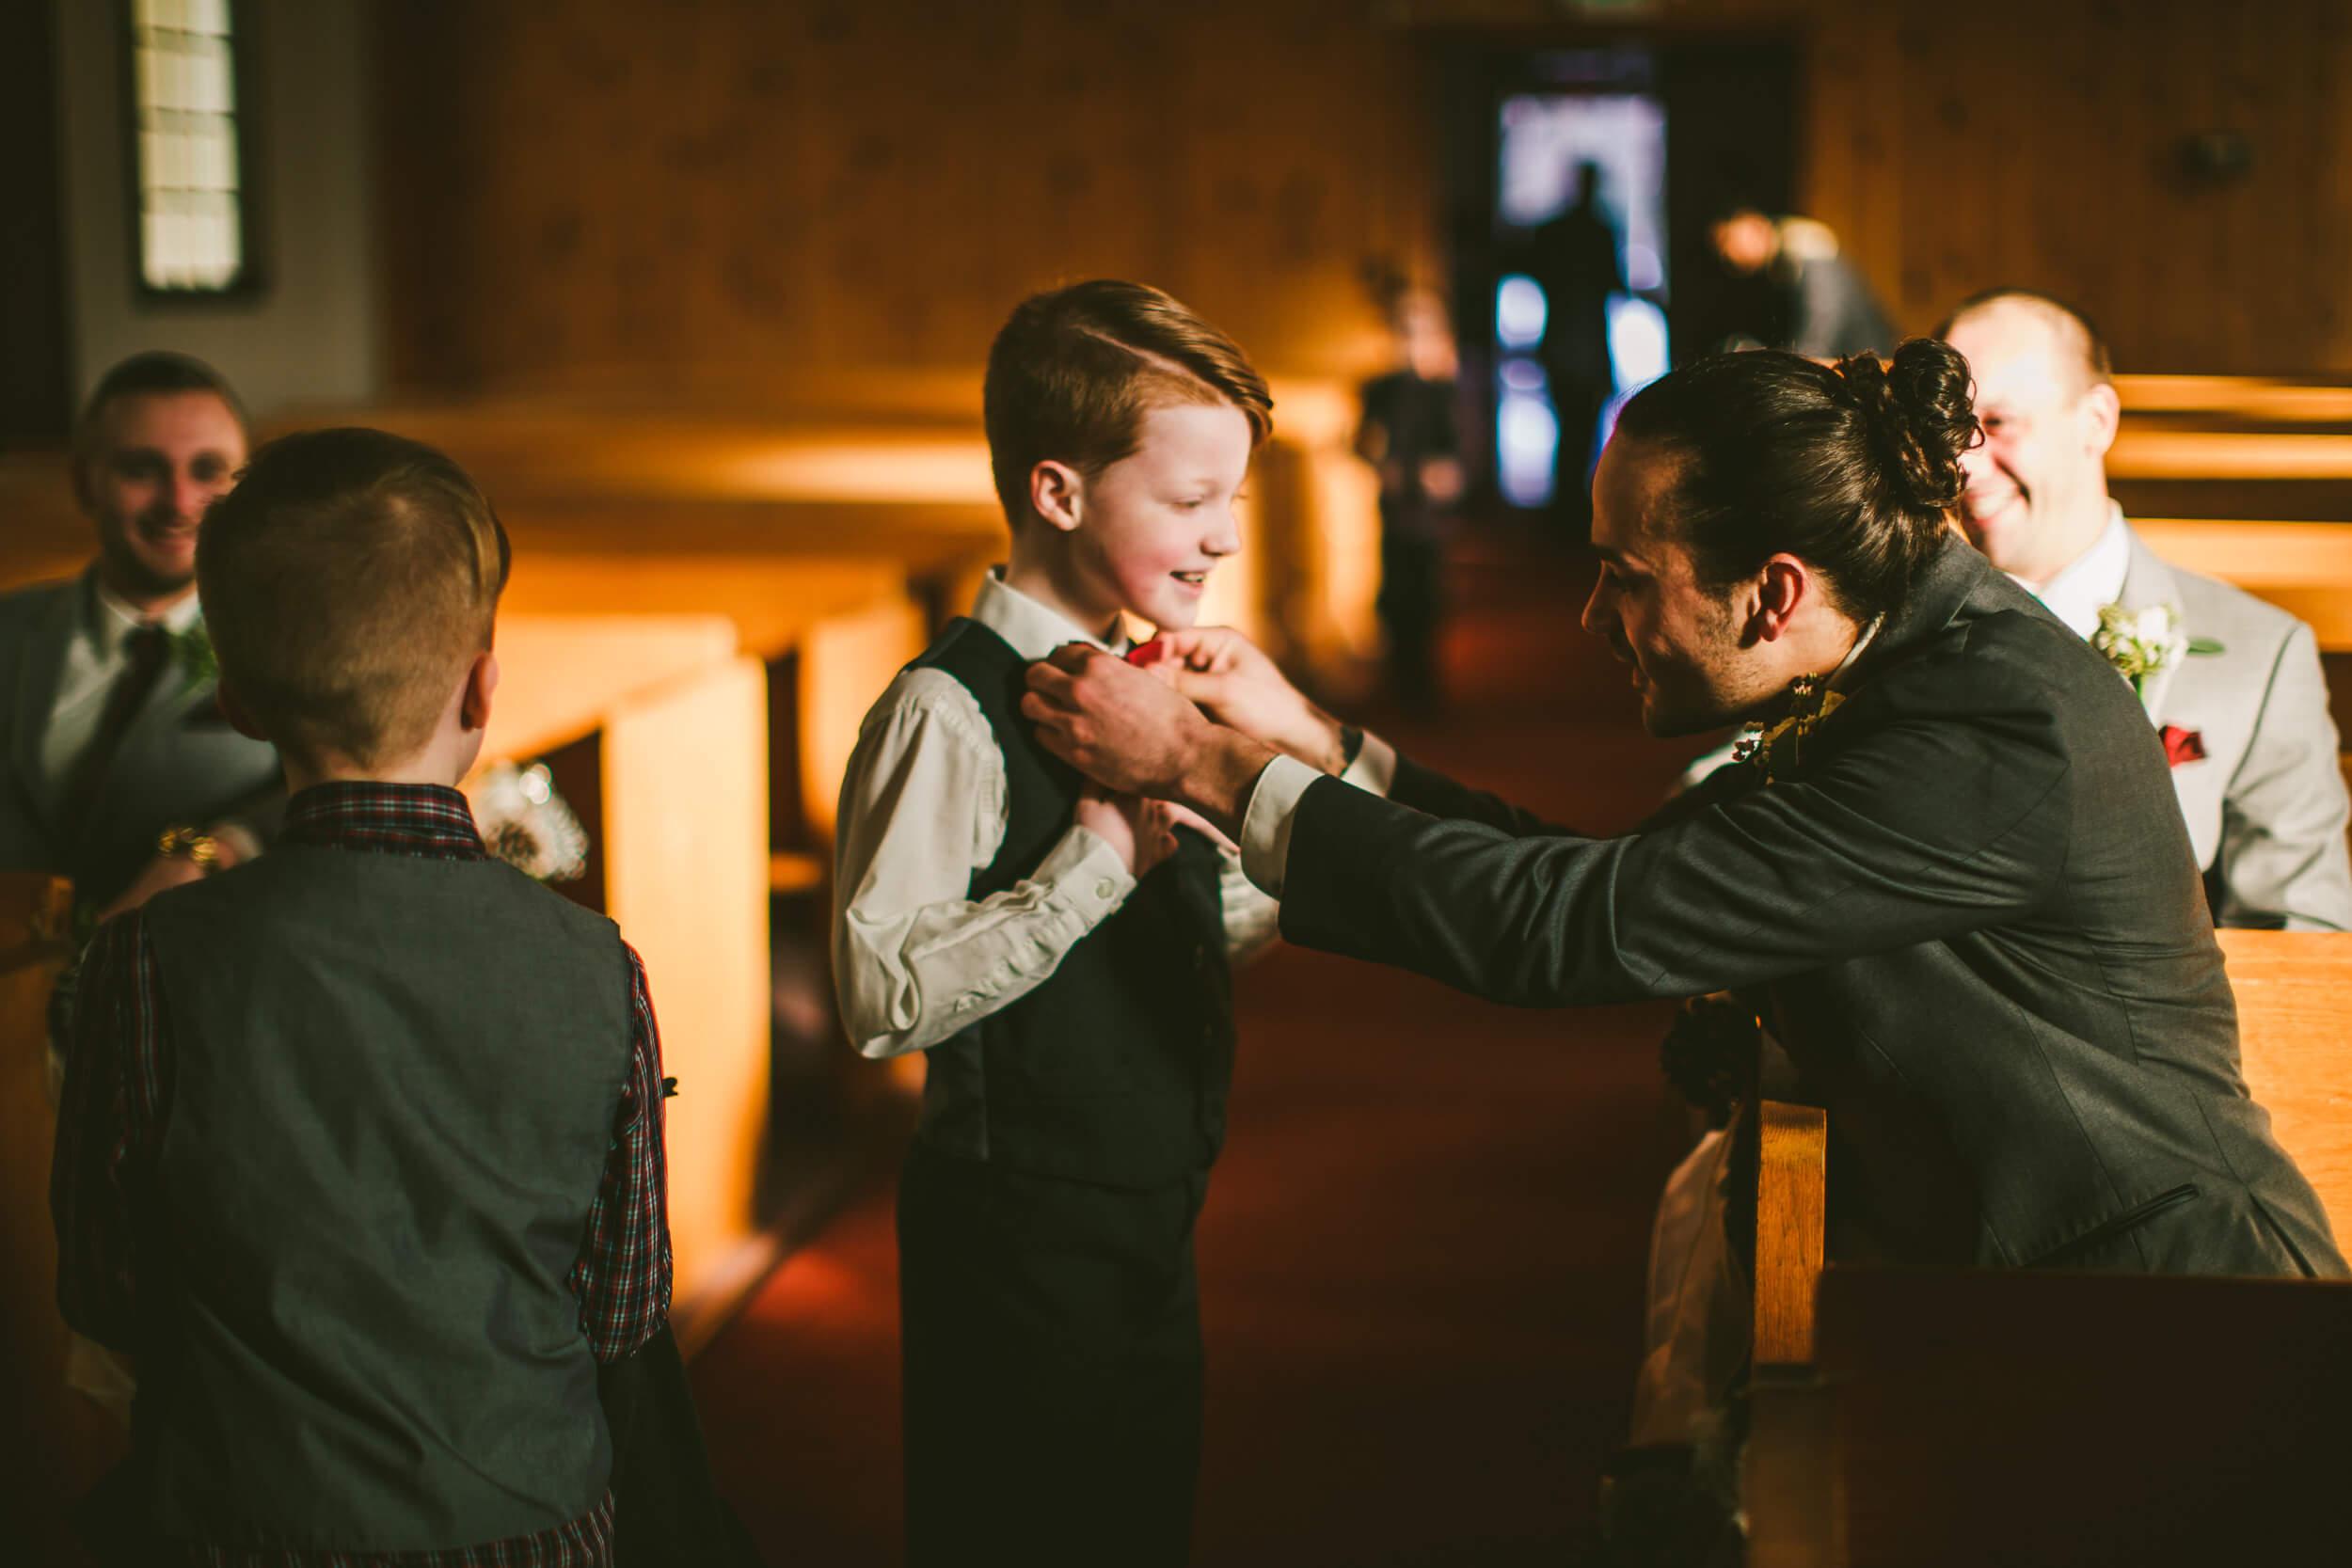 mukogawa winter wedding in spokane (27).jpg